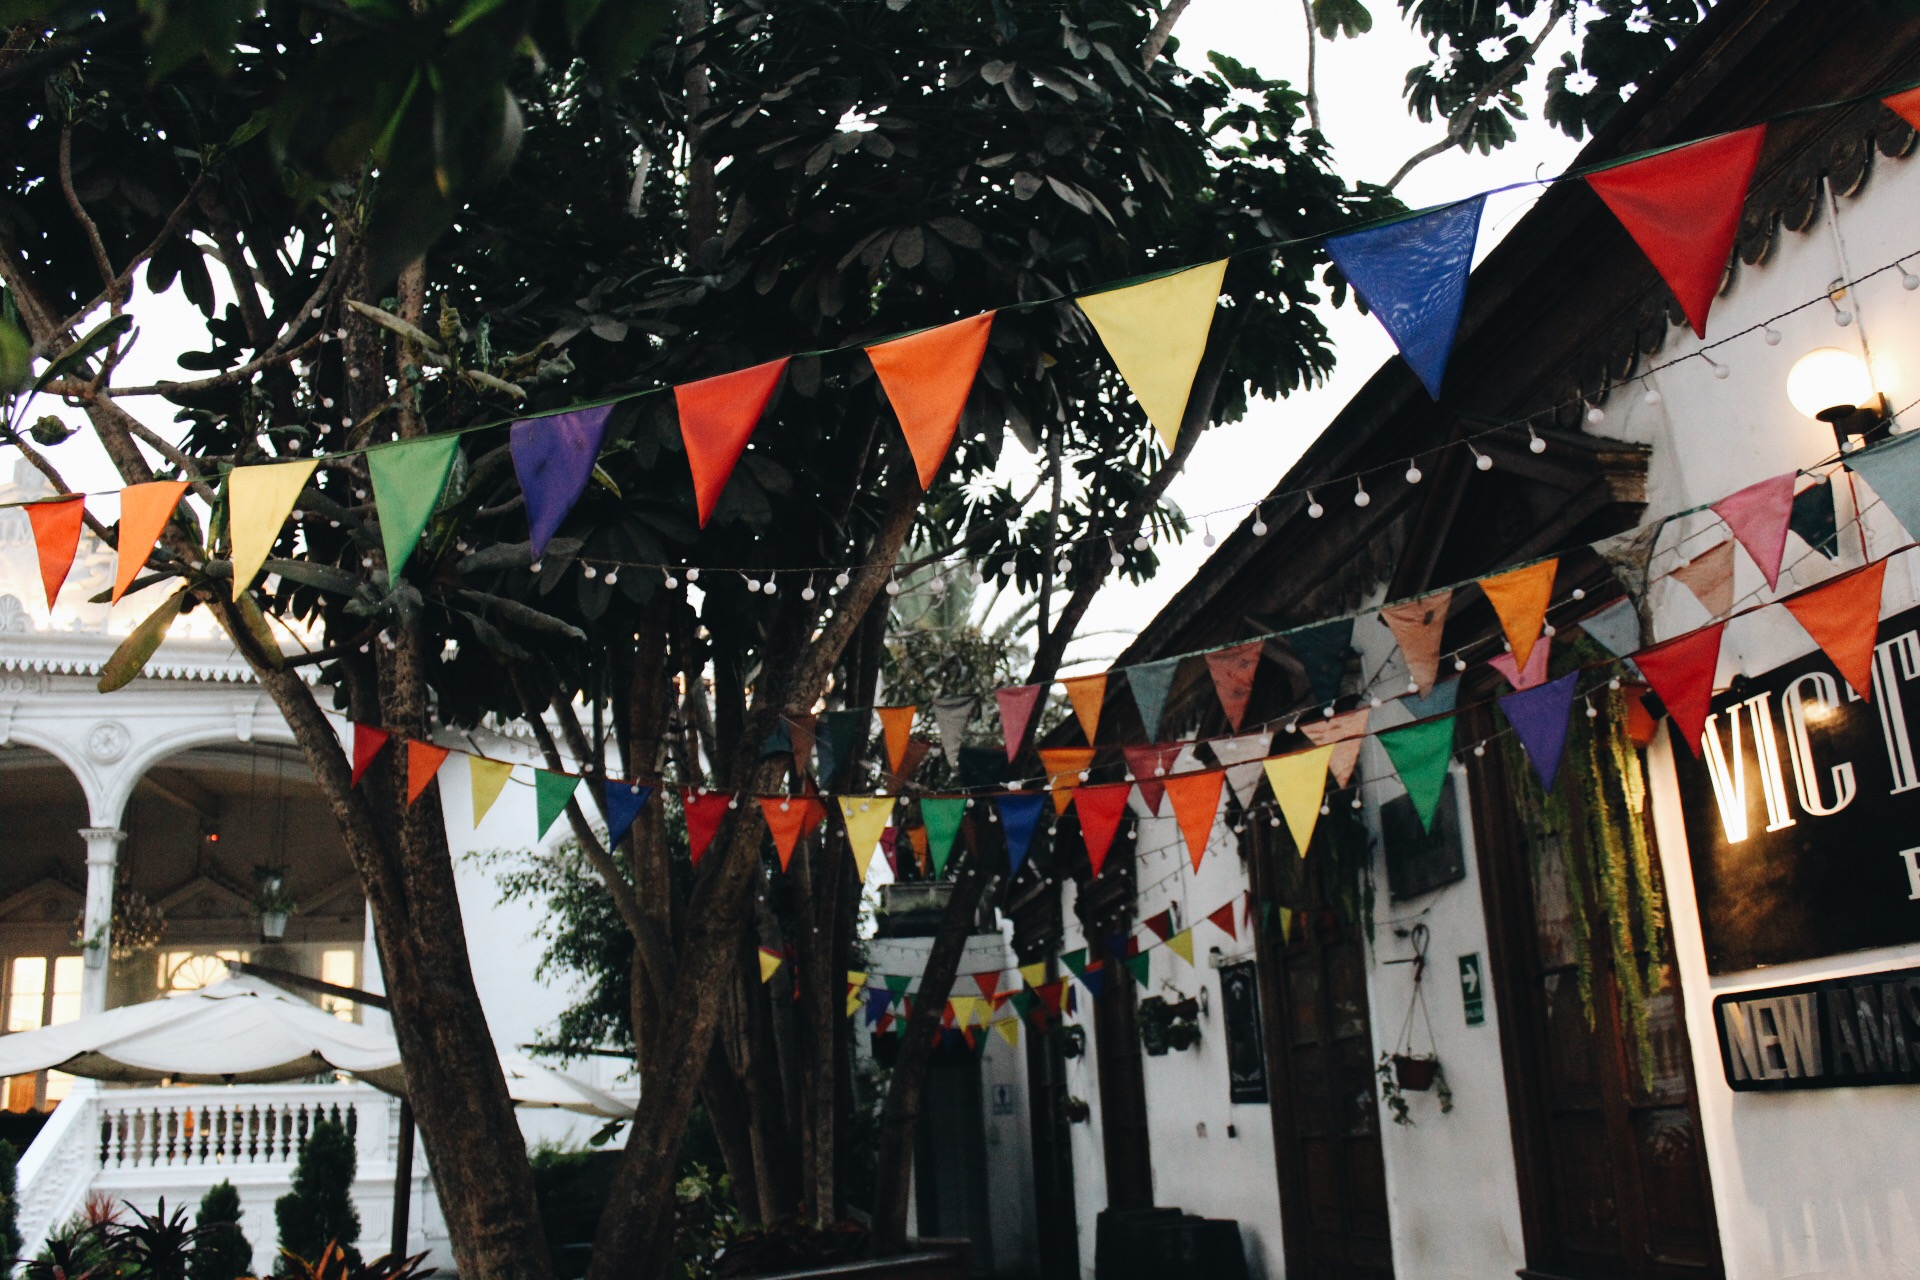 {Barranco square - we saw music, dancing, & artists}